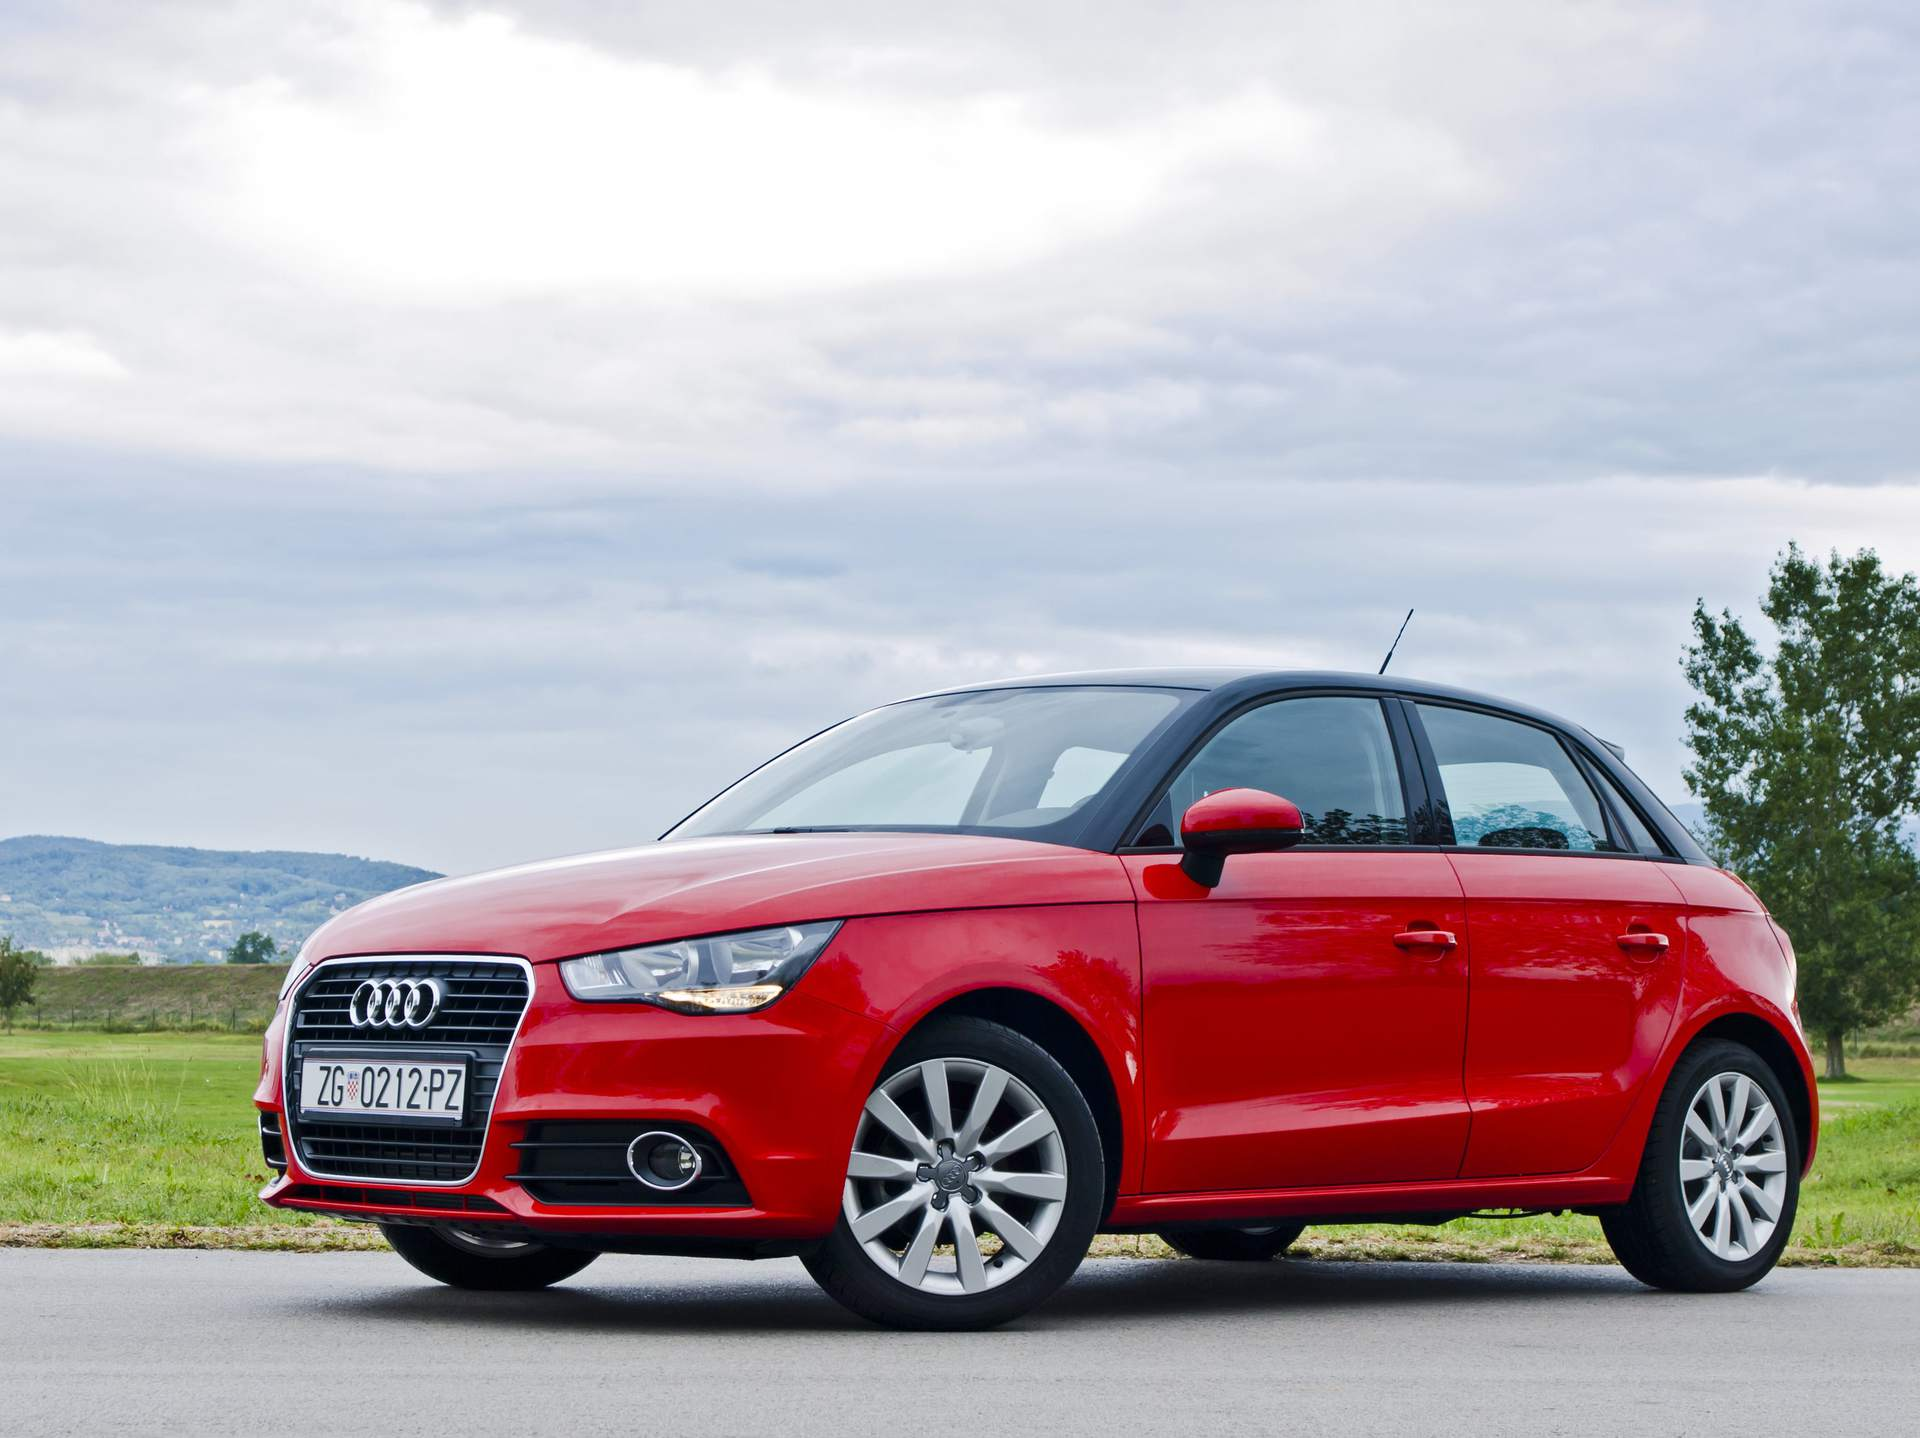 Our Car Repair Shop Services - Audi repair denver